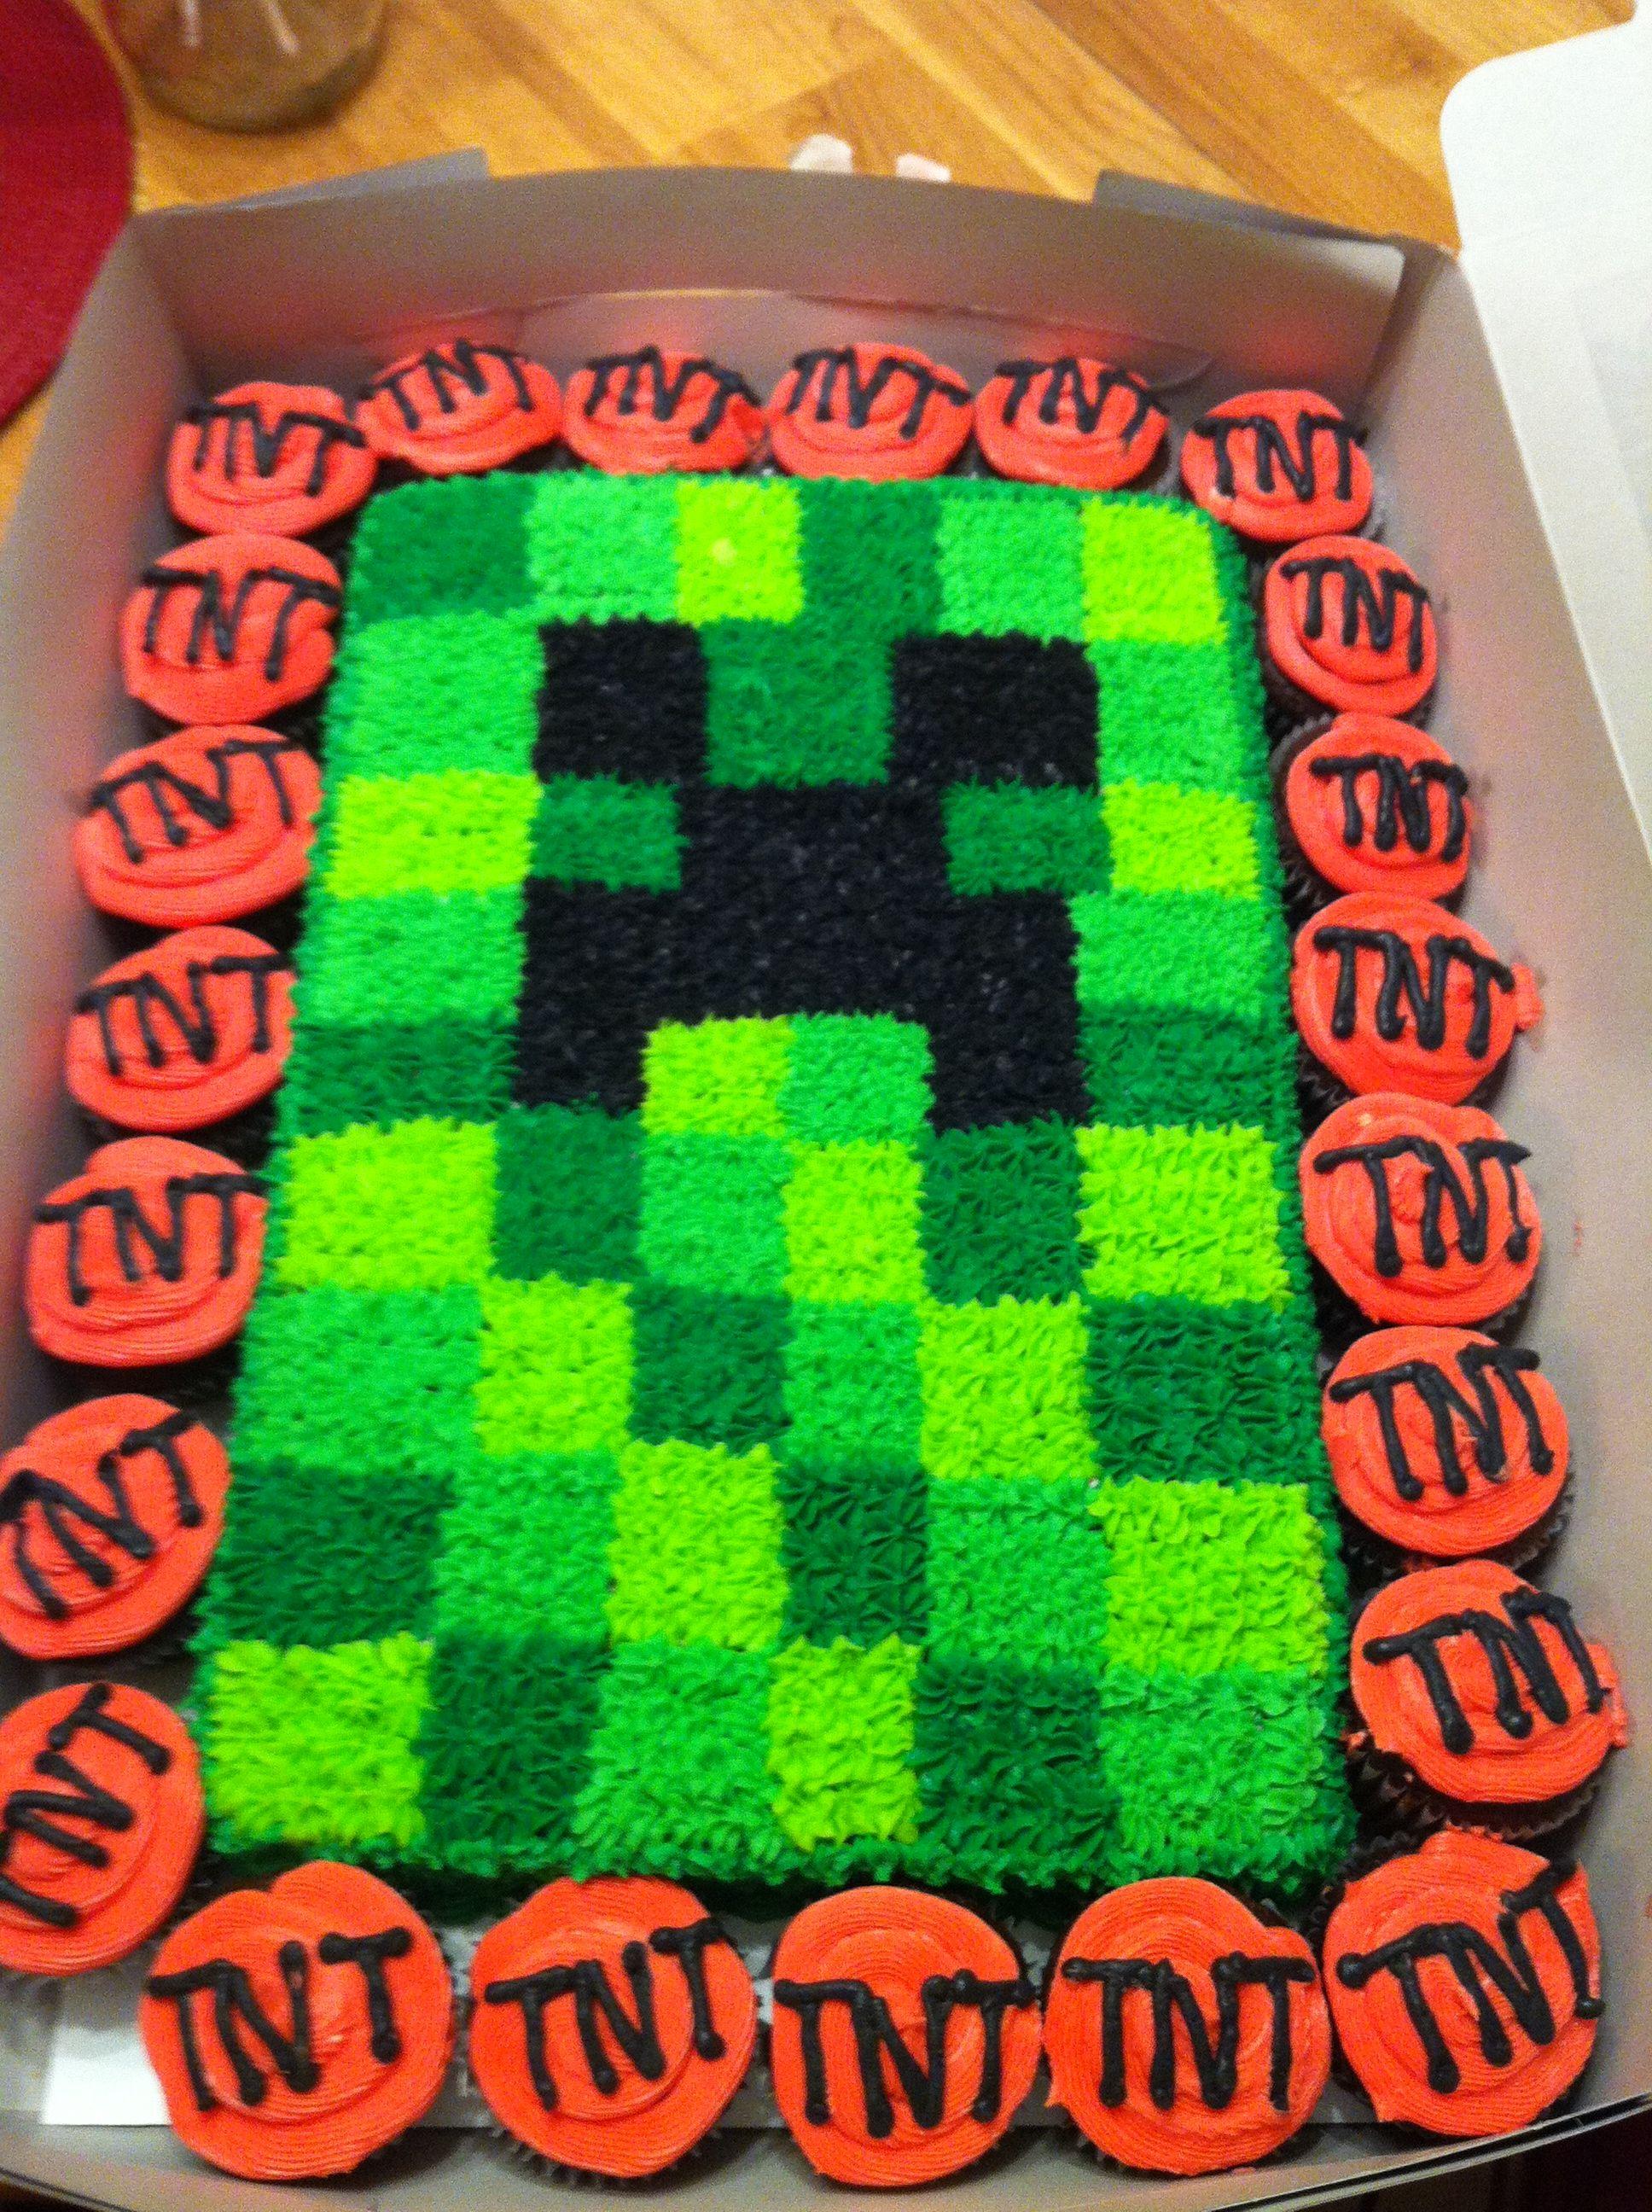 Pin by Nicholas Klayton on minecrOft :)  Minecraft birthday cake